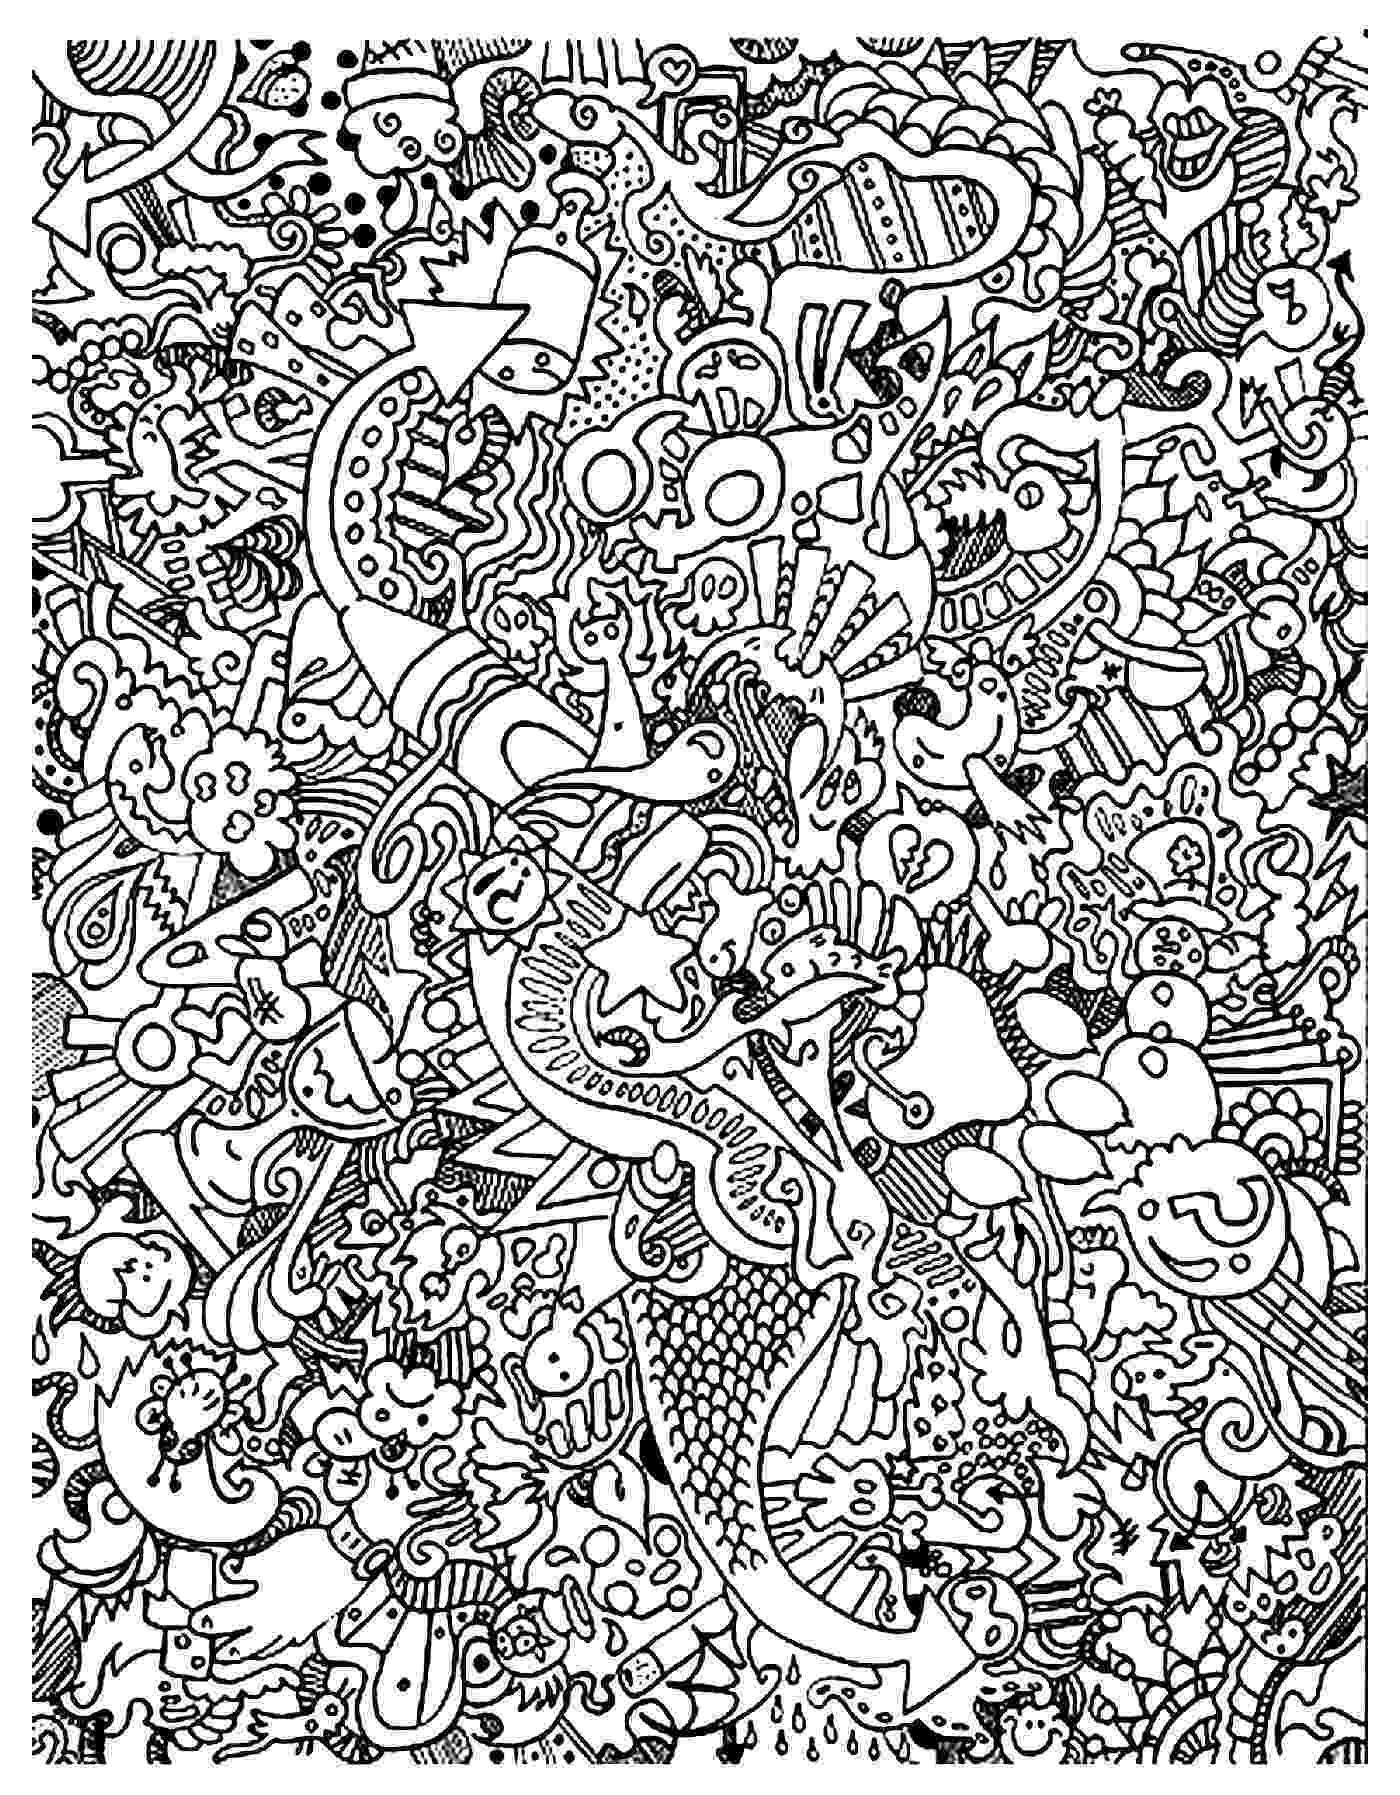 doodle art coloring book doodle art coloring page enjoy coloring doole art coloring book art doodle